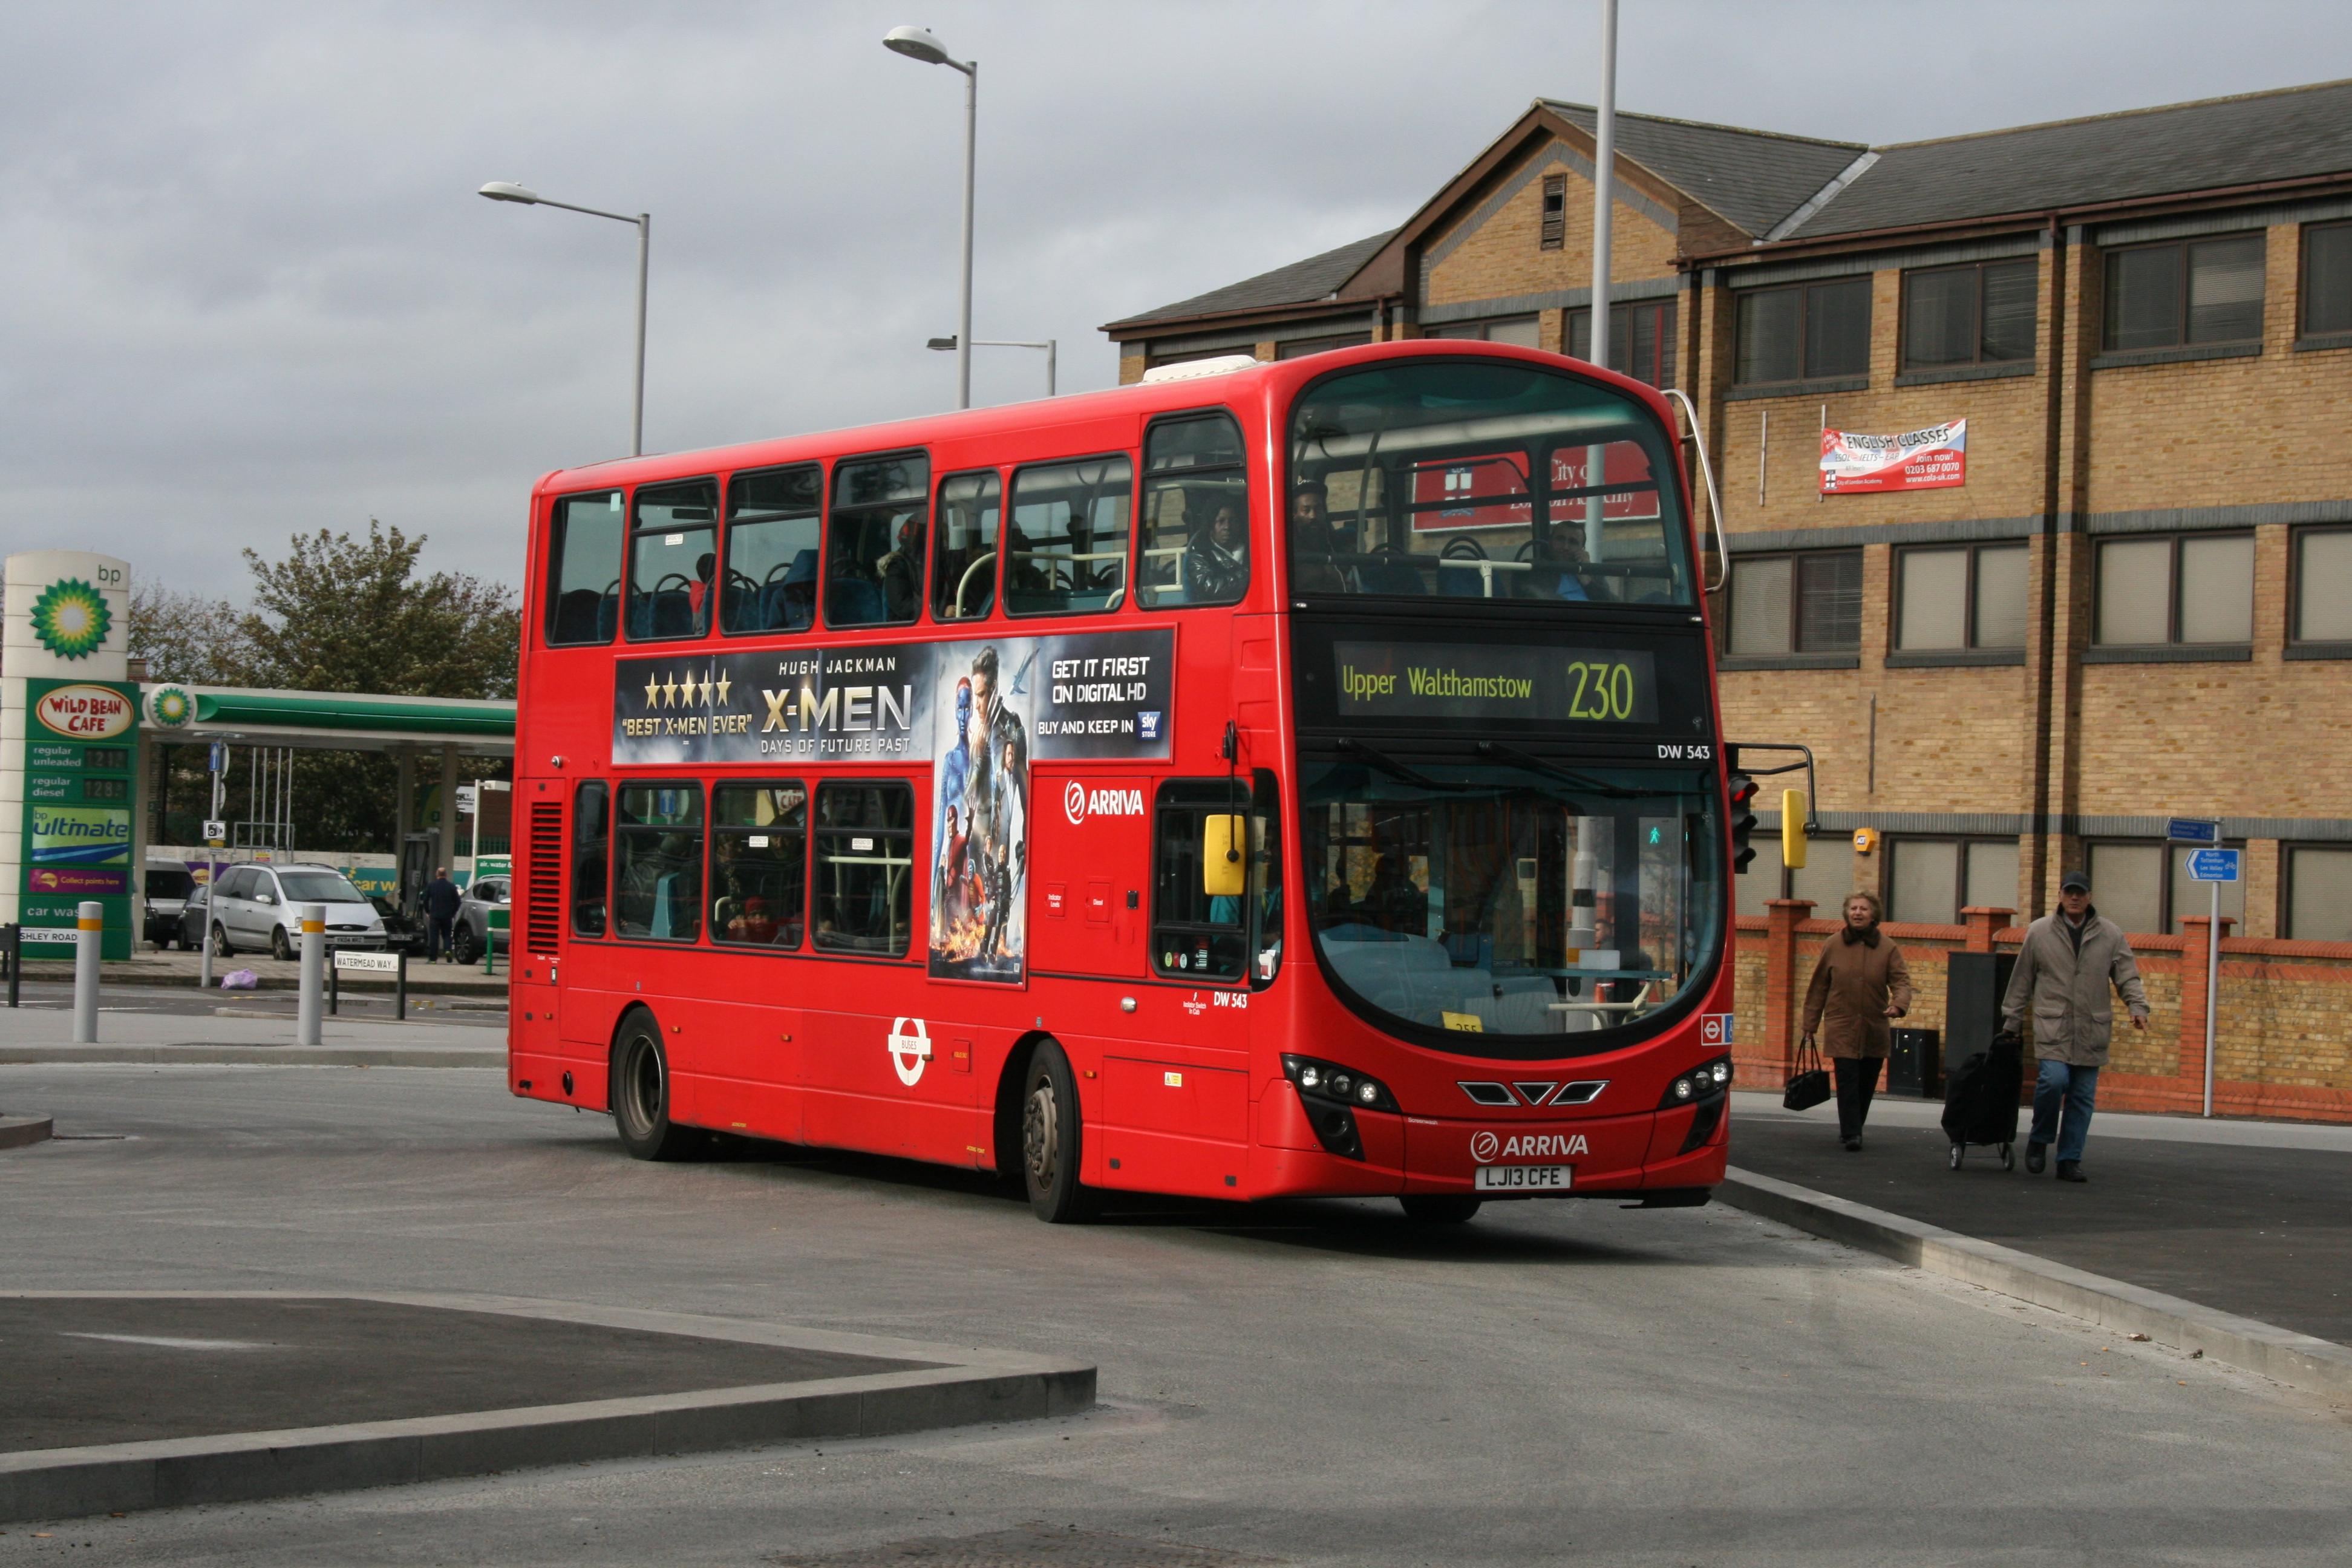 DW543 on Route 230 Tottenham Hale Bus Station  15128589234 jpg KJ9NX2Dk